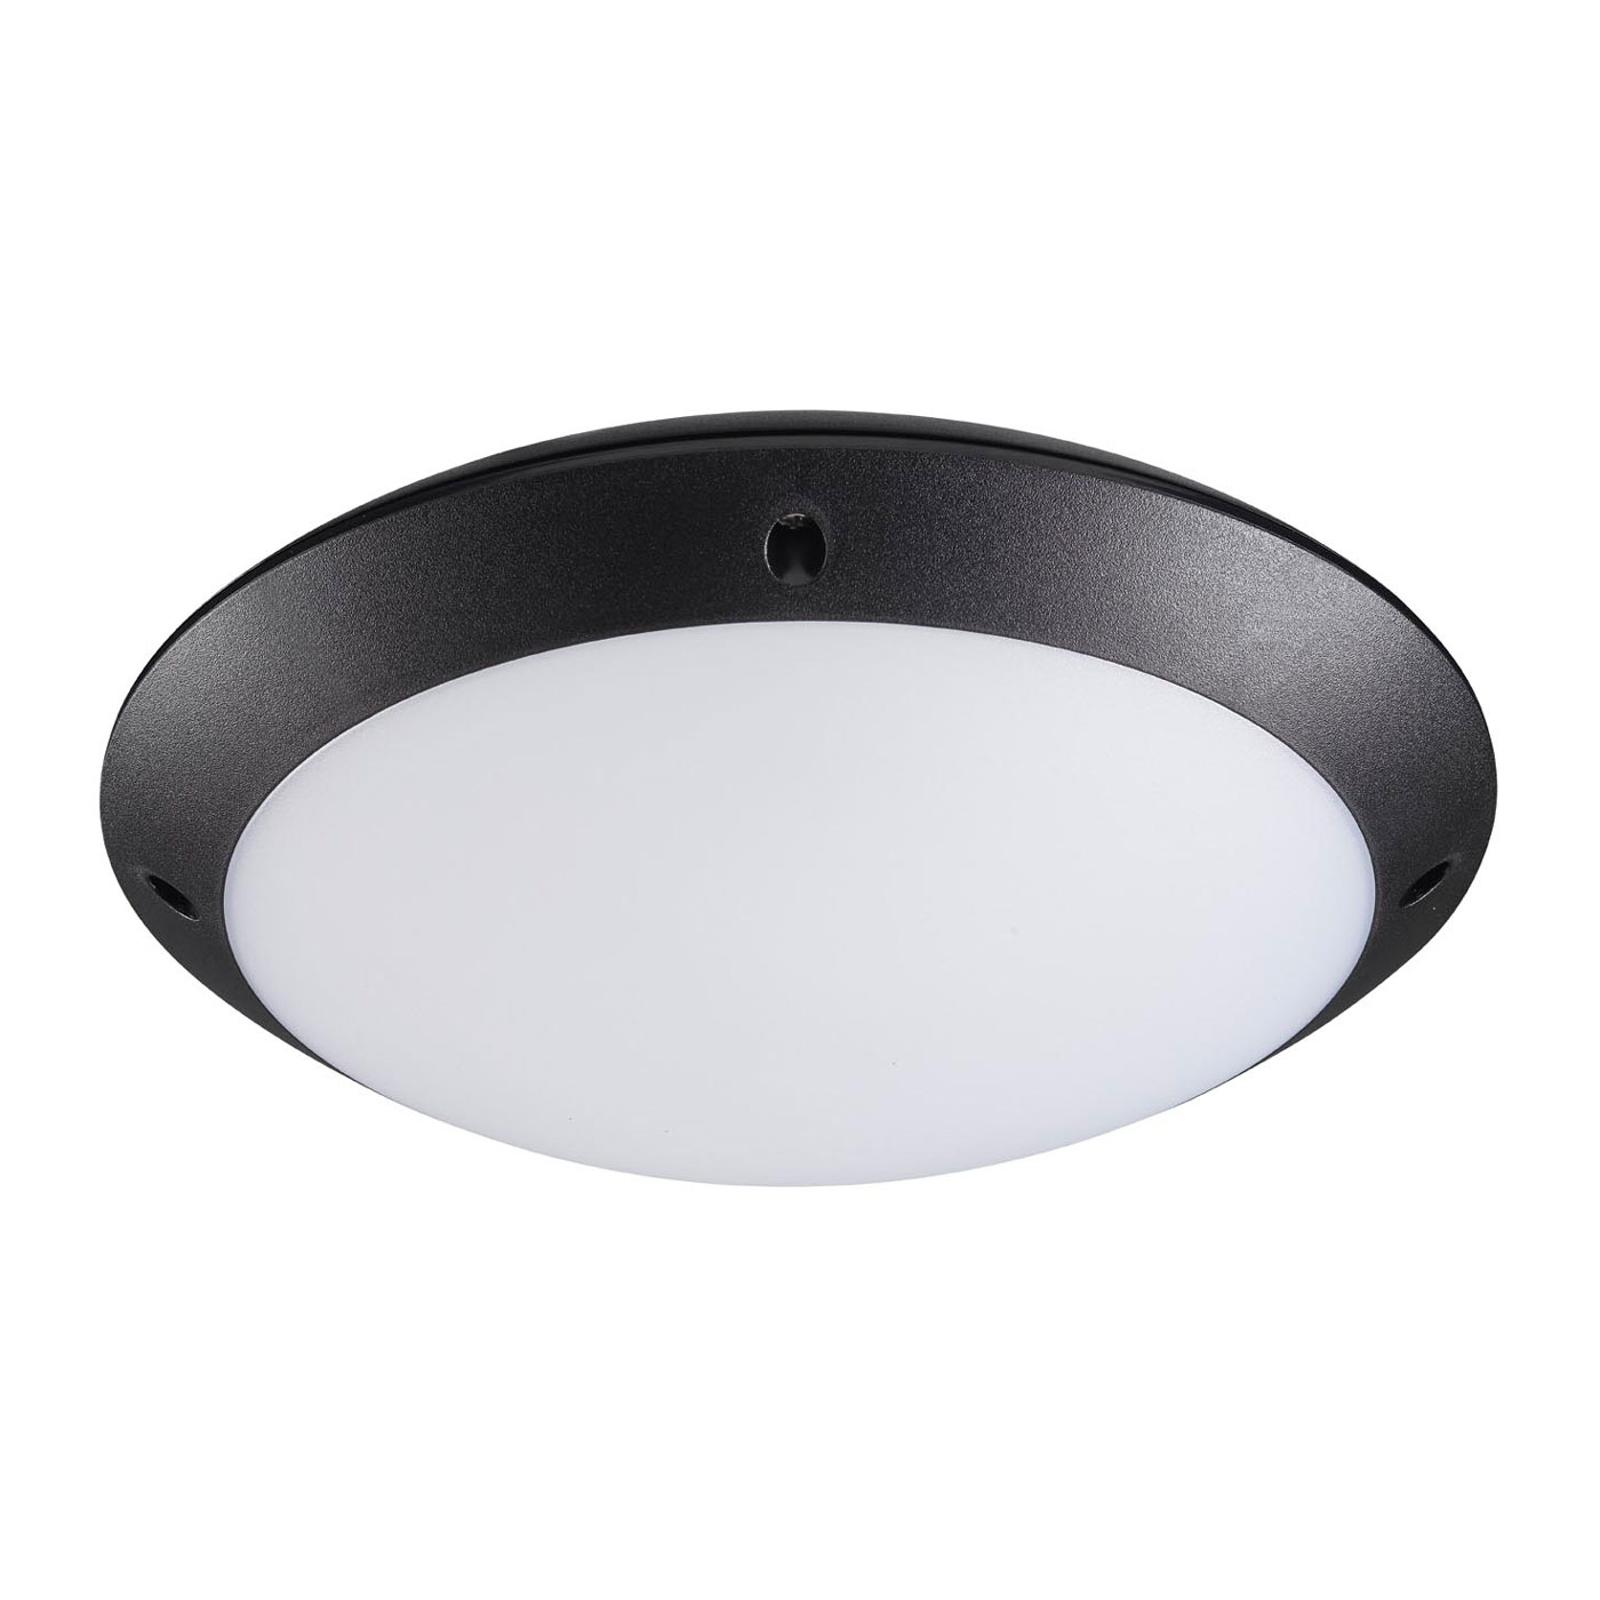 Sylvania Start taklampe SensorDim 4000K svart